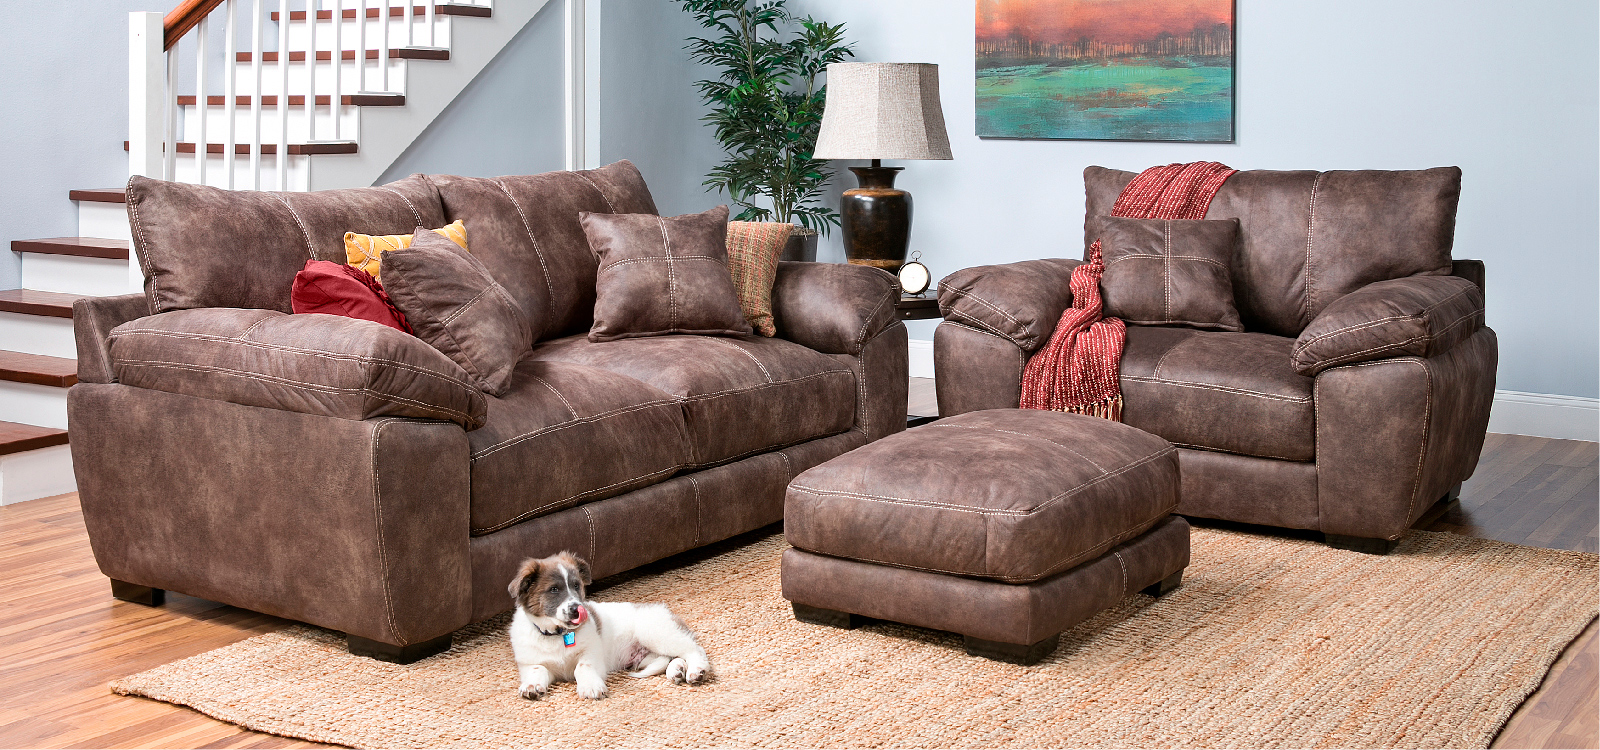 Slumberland Furniture Slumberland Online Store